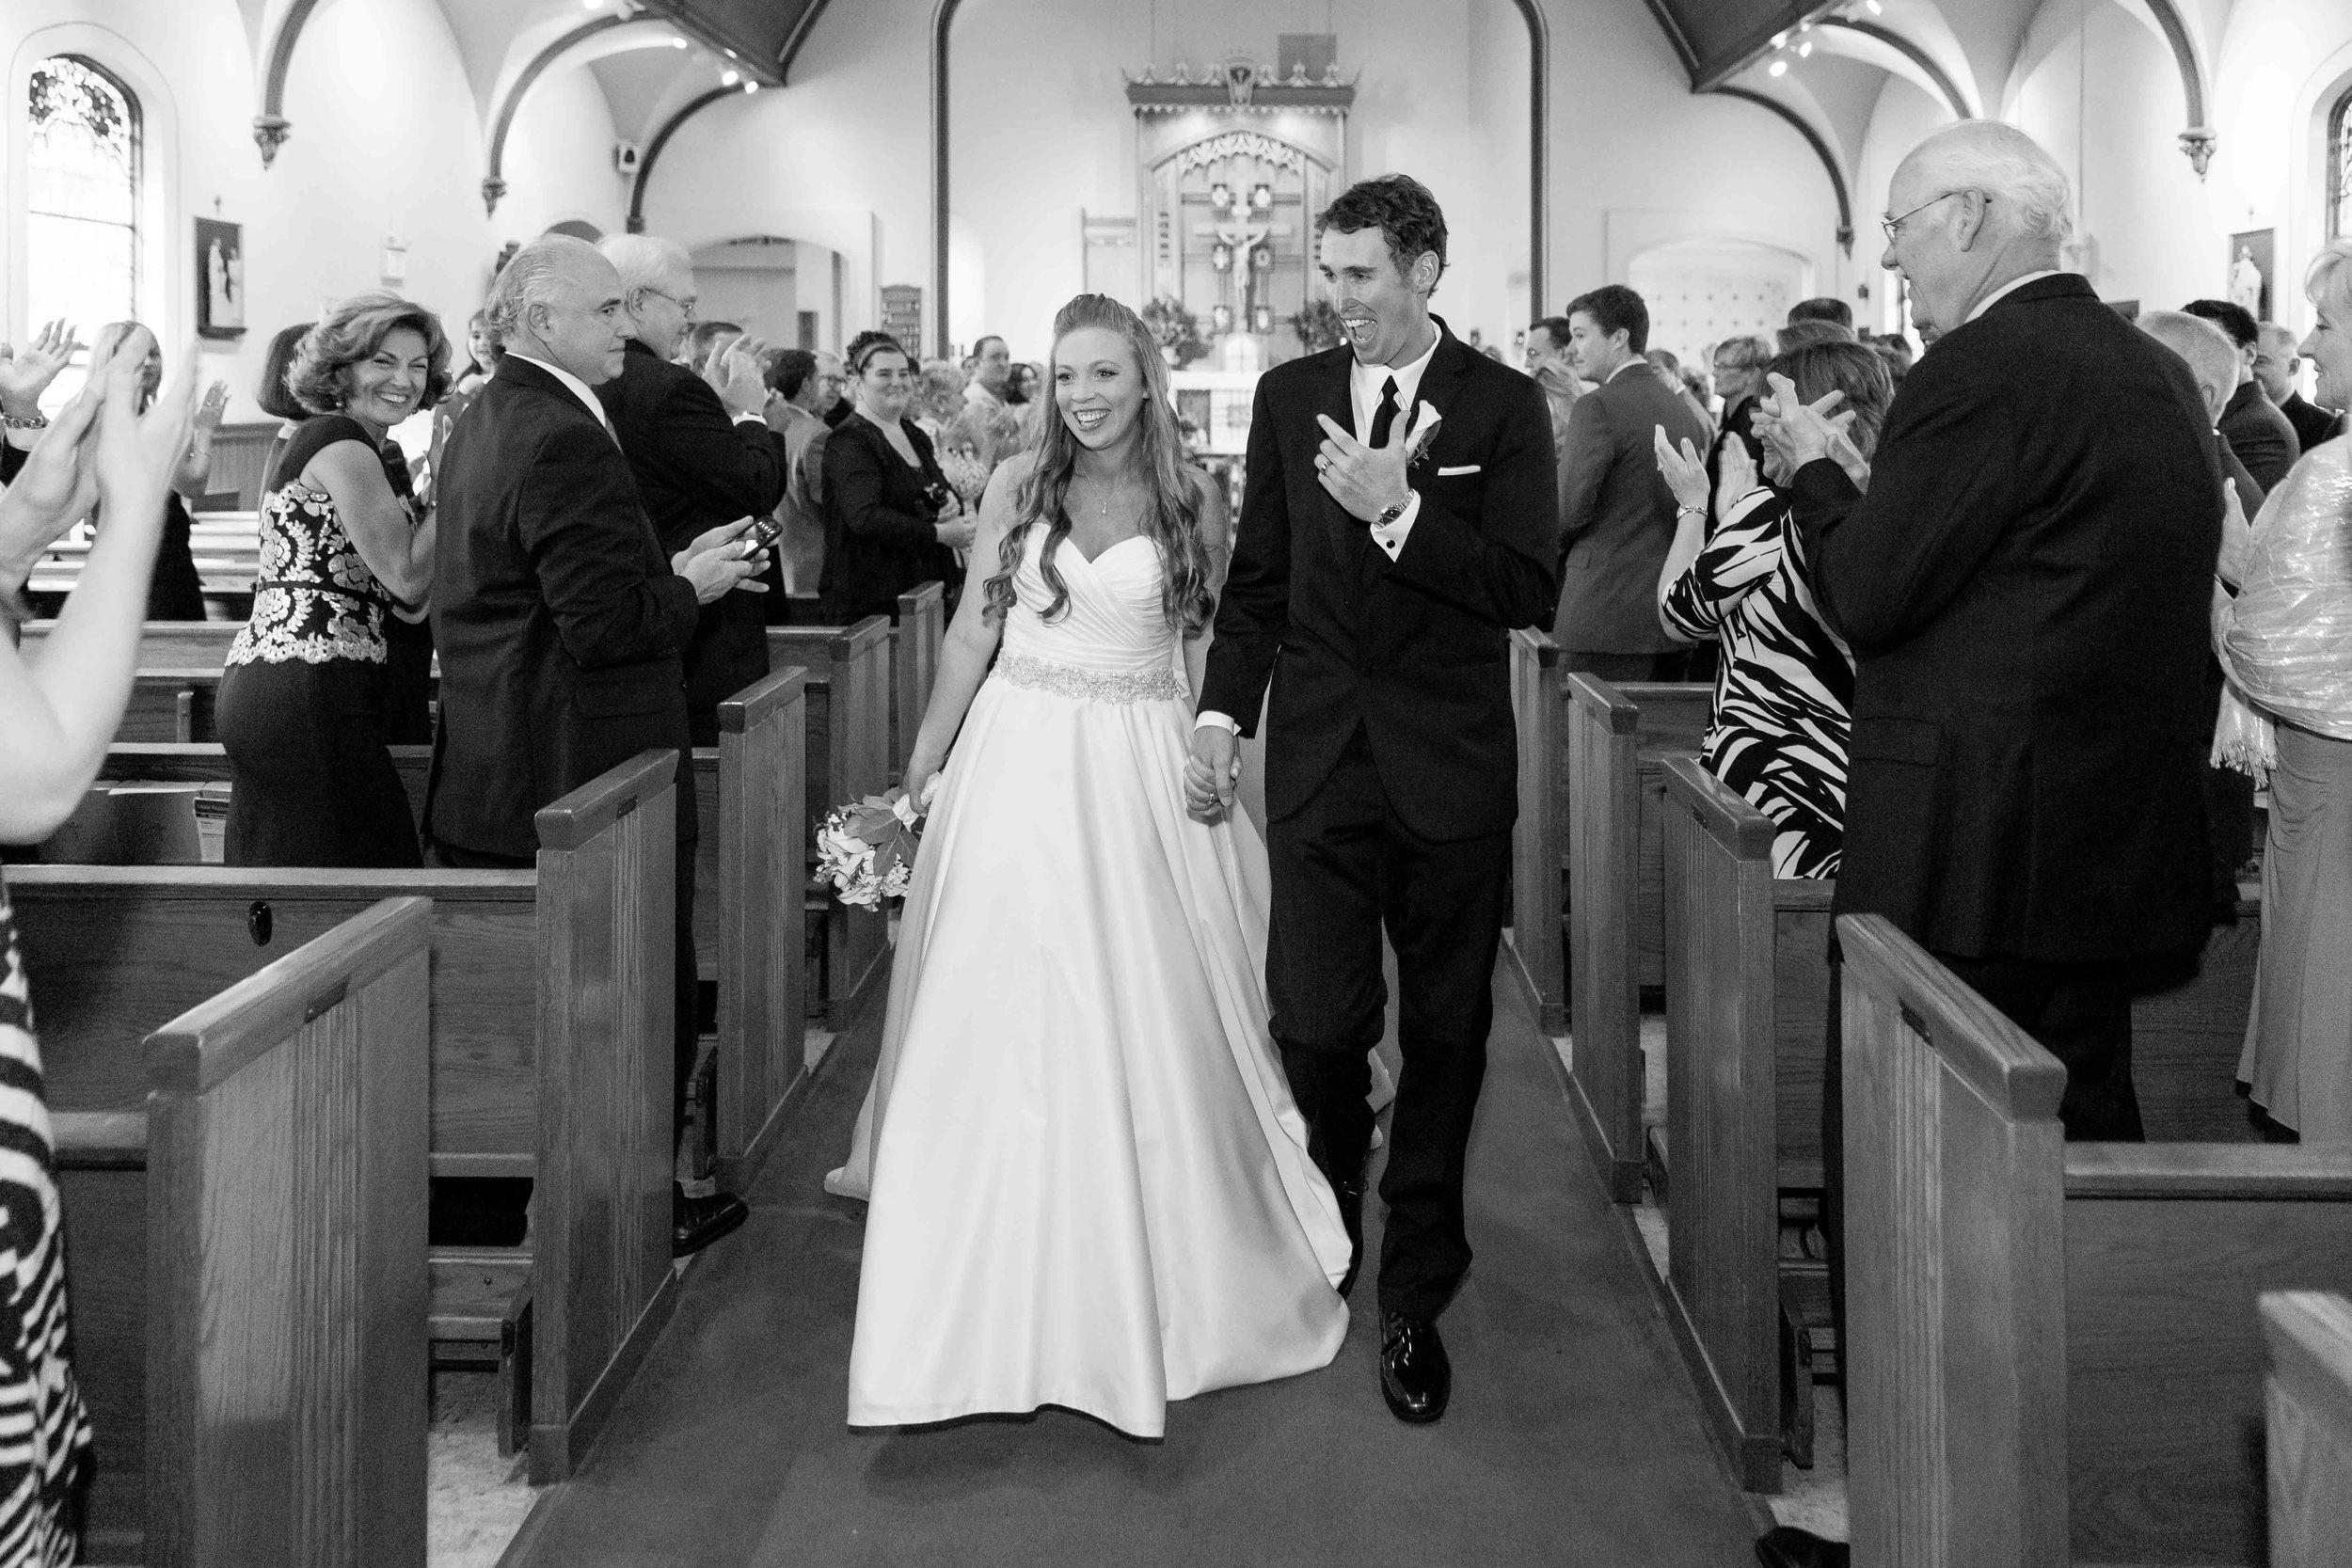 Connecticut-Fall-Wedding-Shuttle-Meadow-Country-Club-CT-Documentary-Wedding-Photographer-Jacek-Dolata-7.jpg